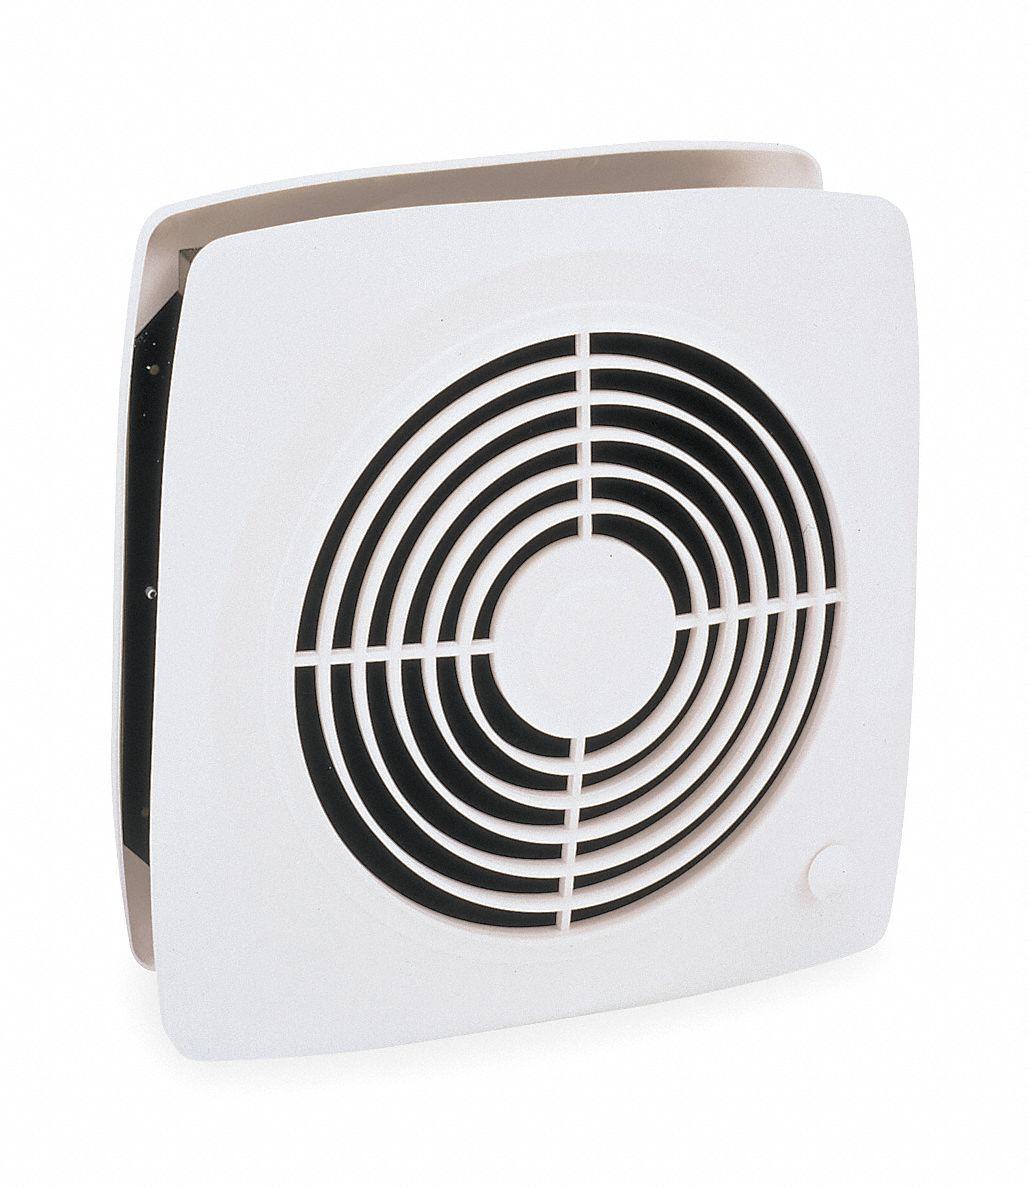 exhaust fan room to room steel adj 3 to 5 1 2 in housing length in